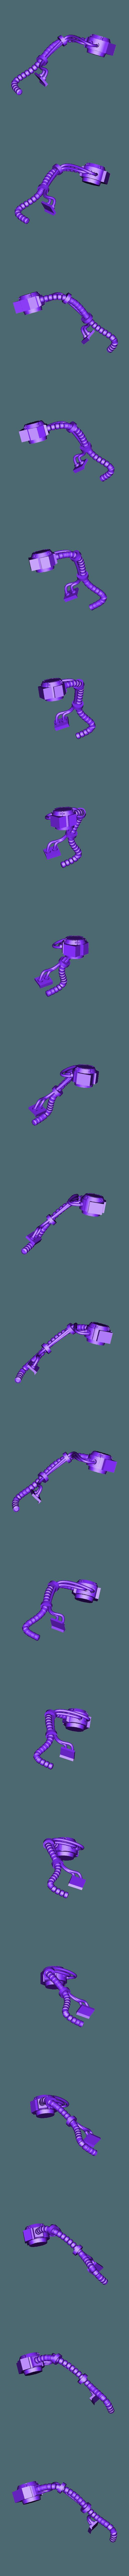 Aggressor_3_Right_Hoses.stl Download free STL file Flame Armed Instigators • 3D printable template, danny_cyanide